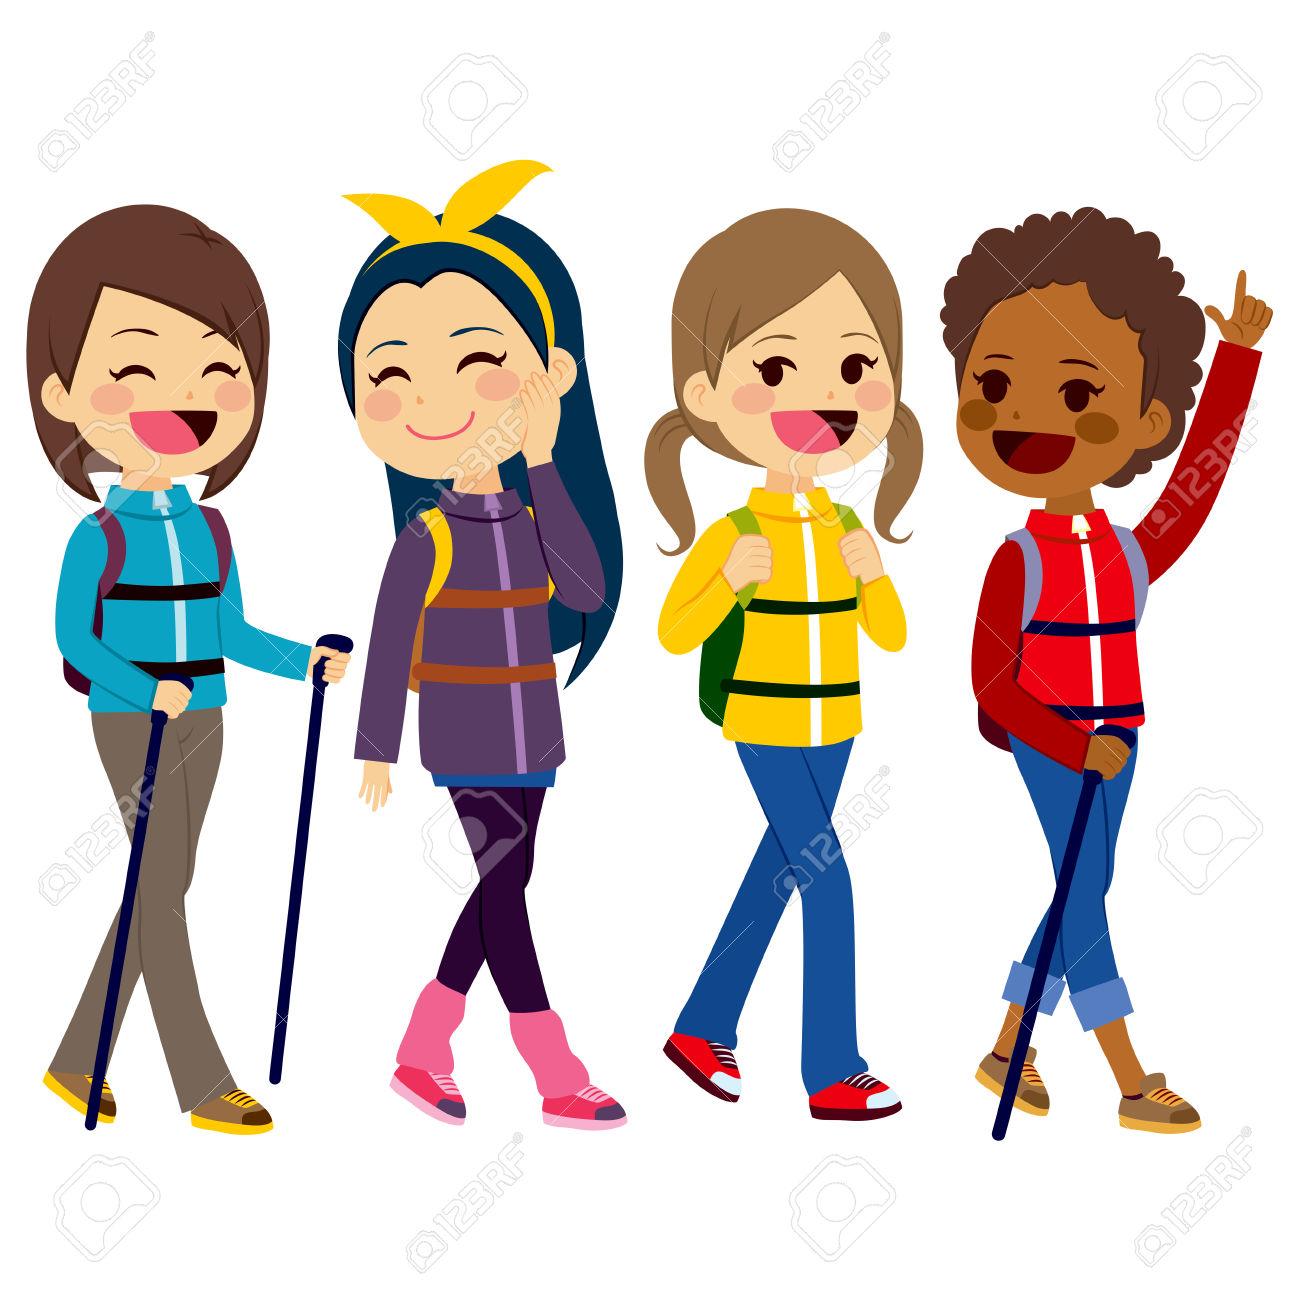 Girl hiking clipart banner download Girl Hiking Clipart | Free download best Girl Hiking Clipart on ... banner download